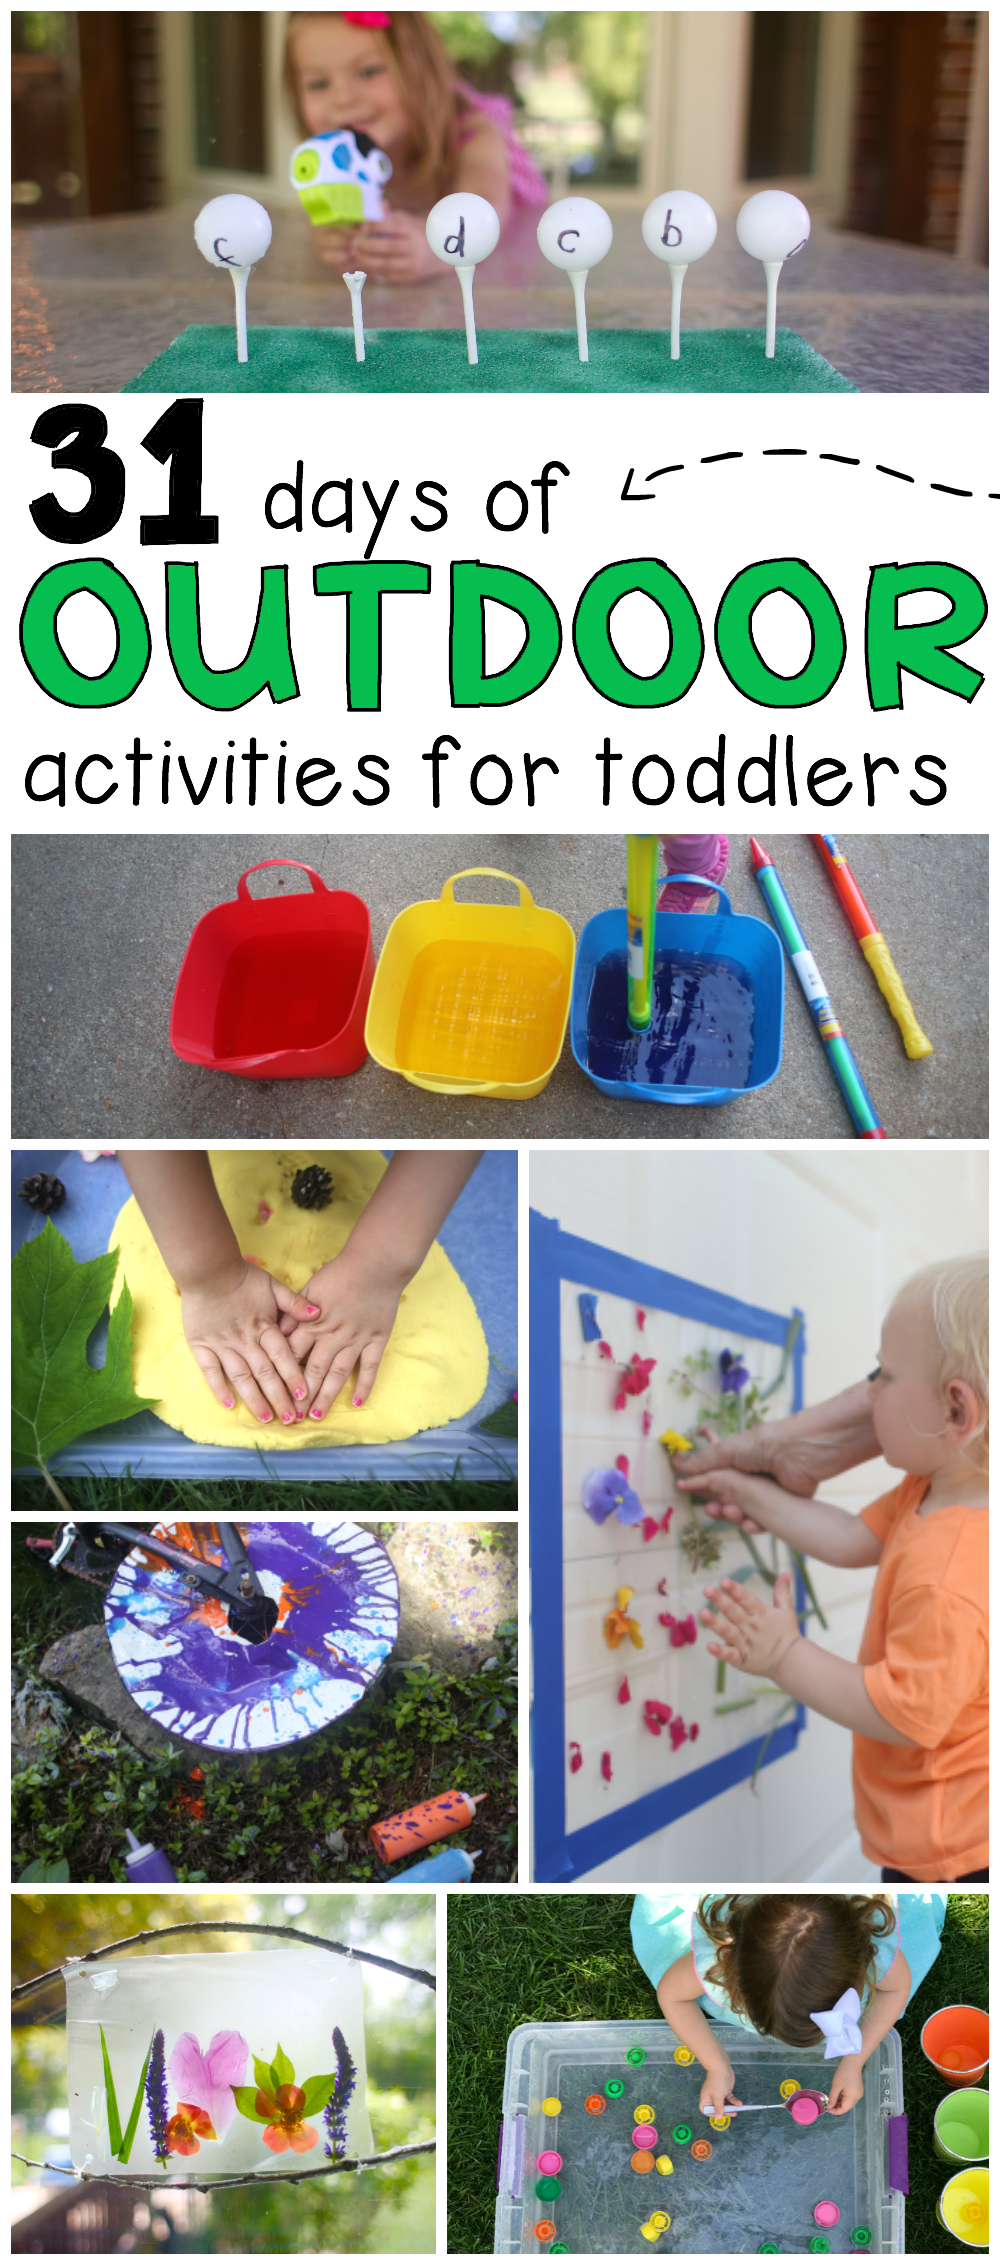 31 Days Of Outdoor Activities For Toddlers Preschool Ideas